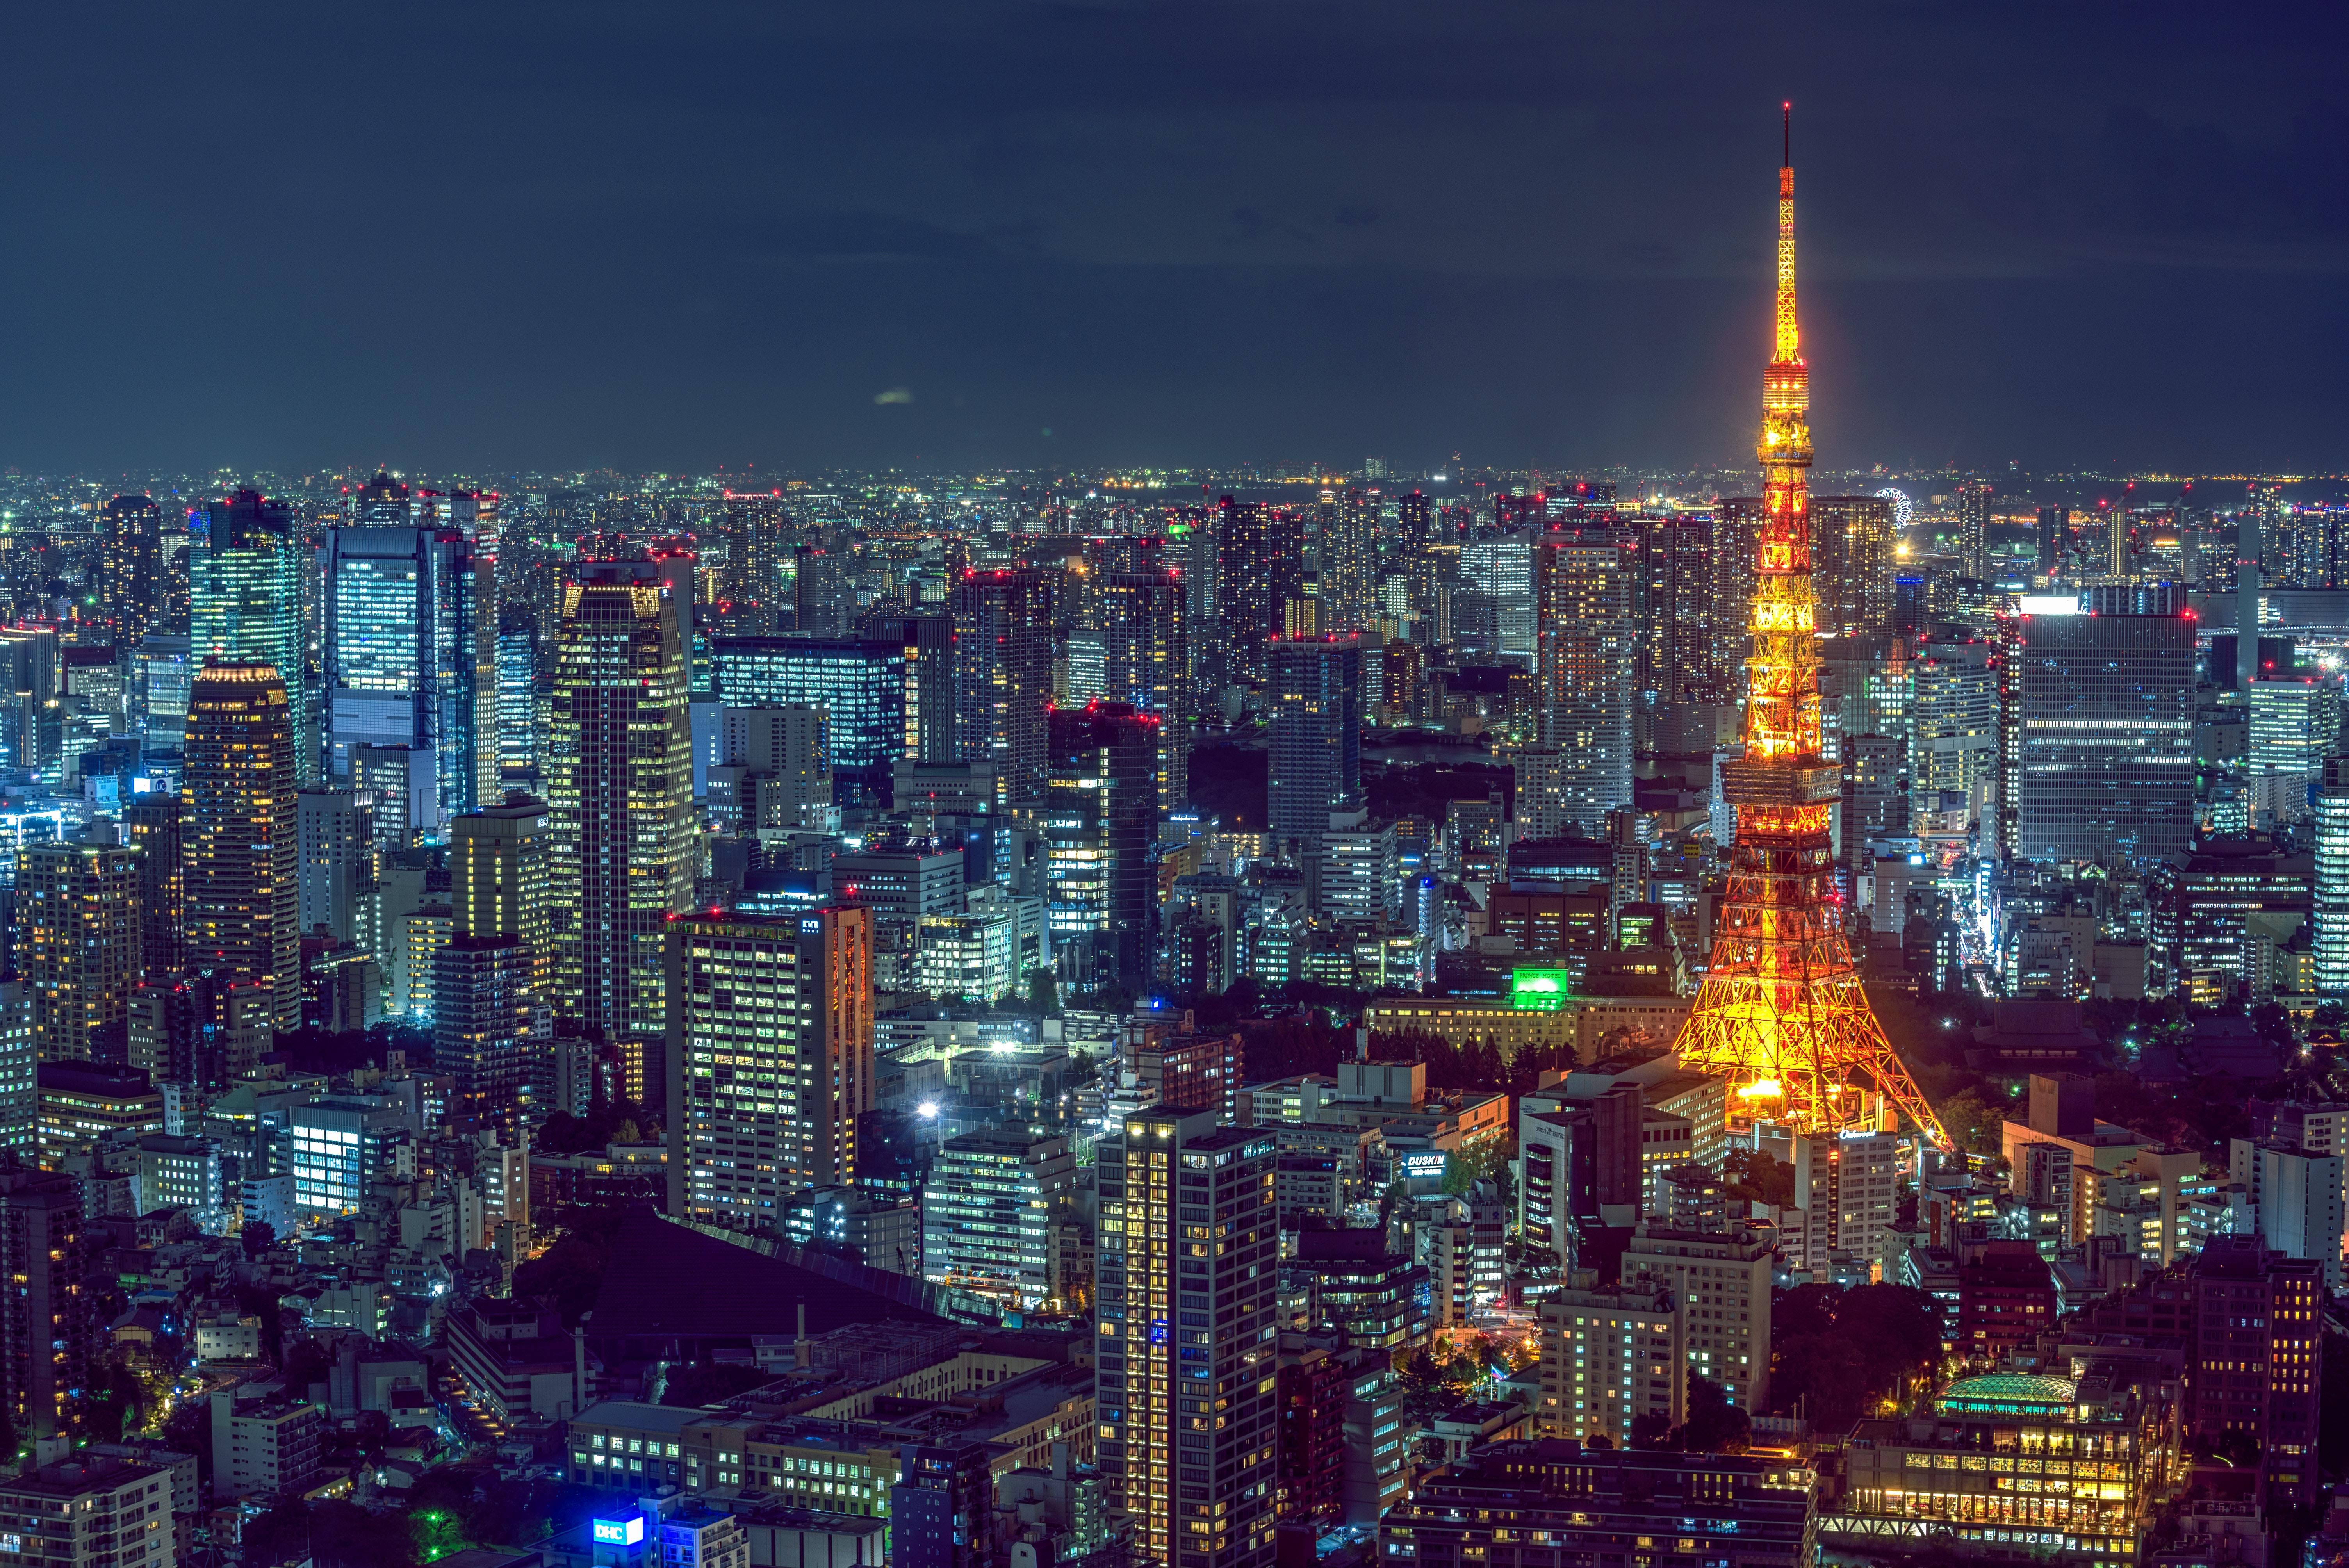 Night skyline of Tokyo